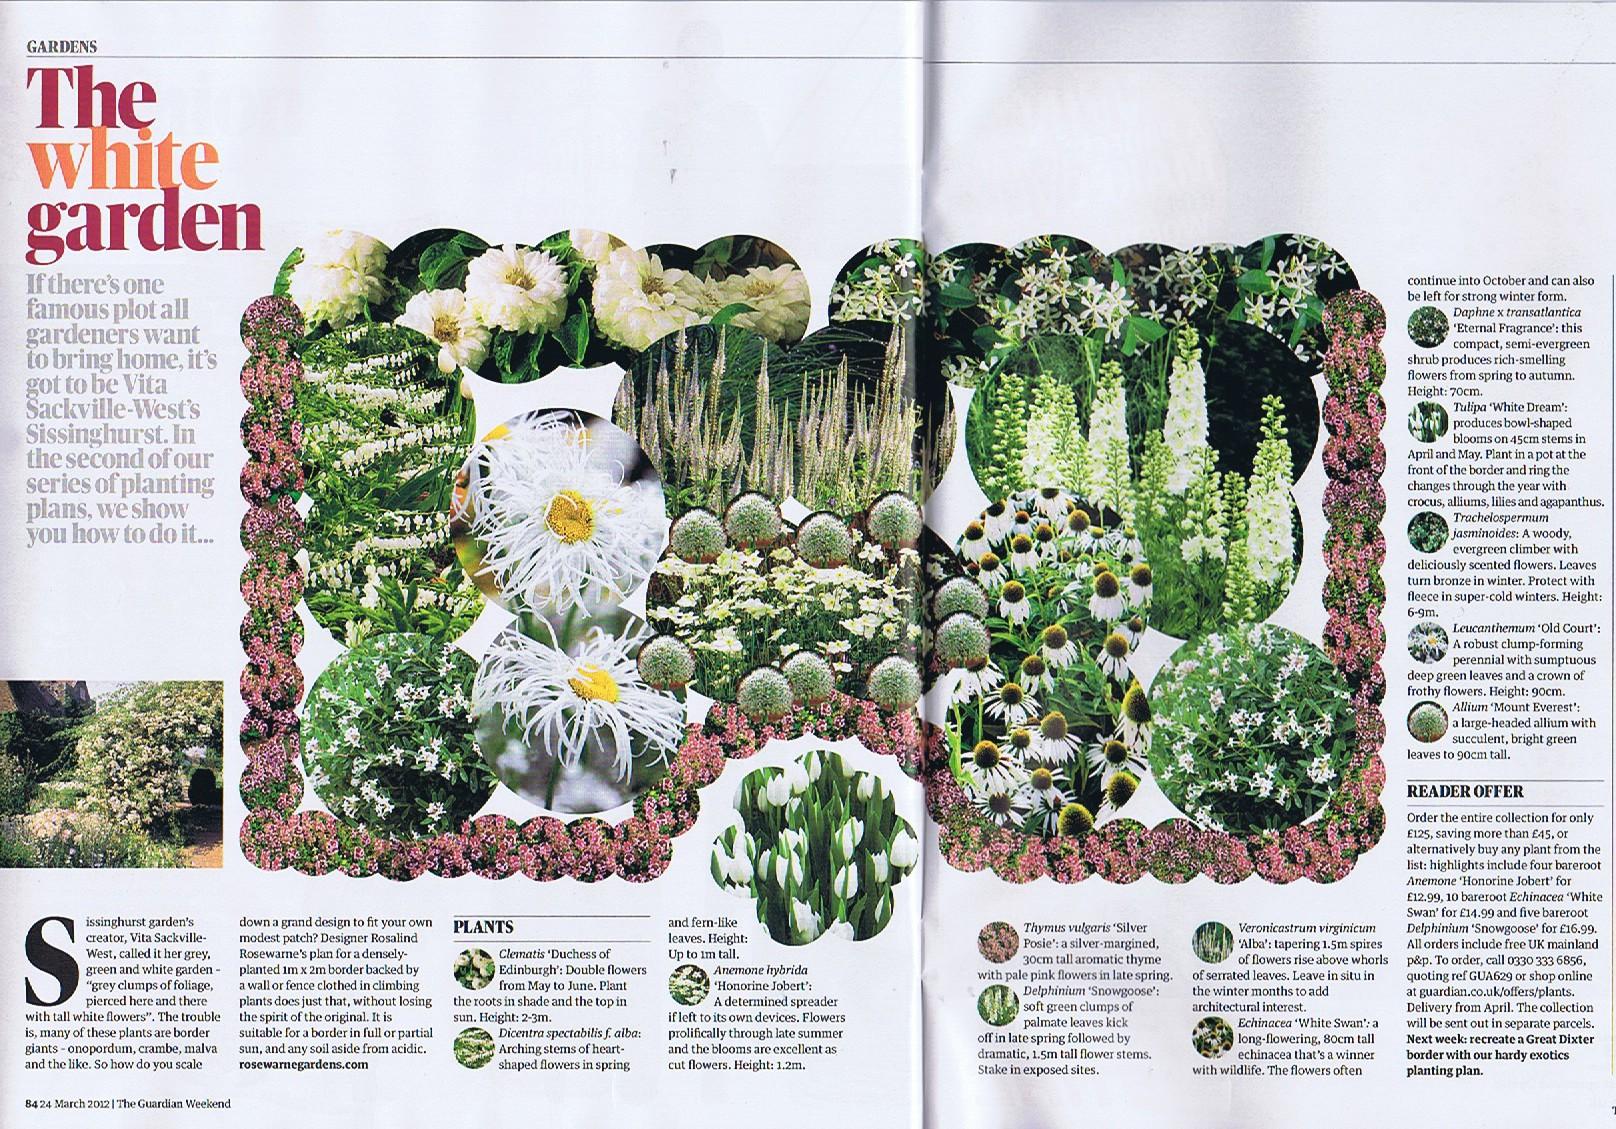 The White Garden - Guardian Weekend Magazine 24/03/2012